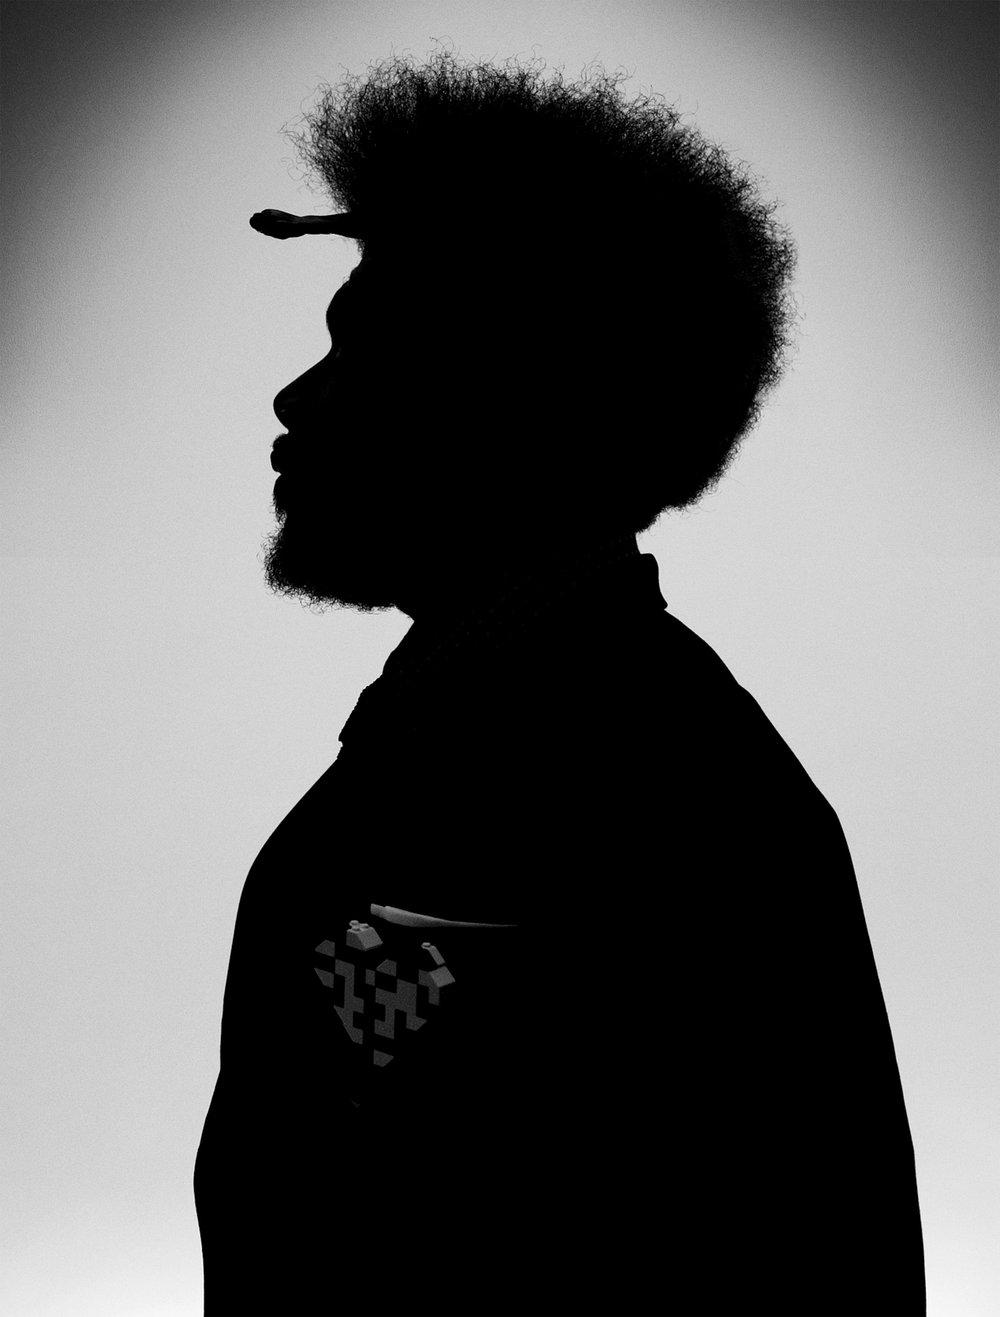 The Roots_Ben Watts Photographer_Rebecca Pietri Stylist _Questlove_B:W_4.jpg